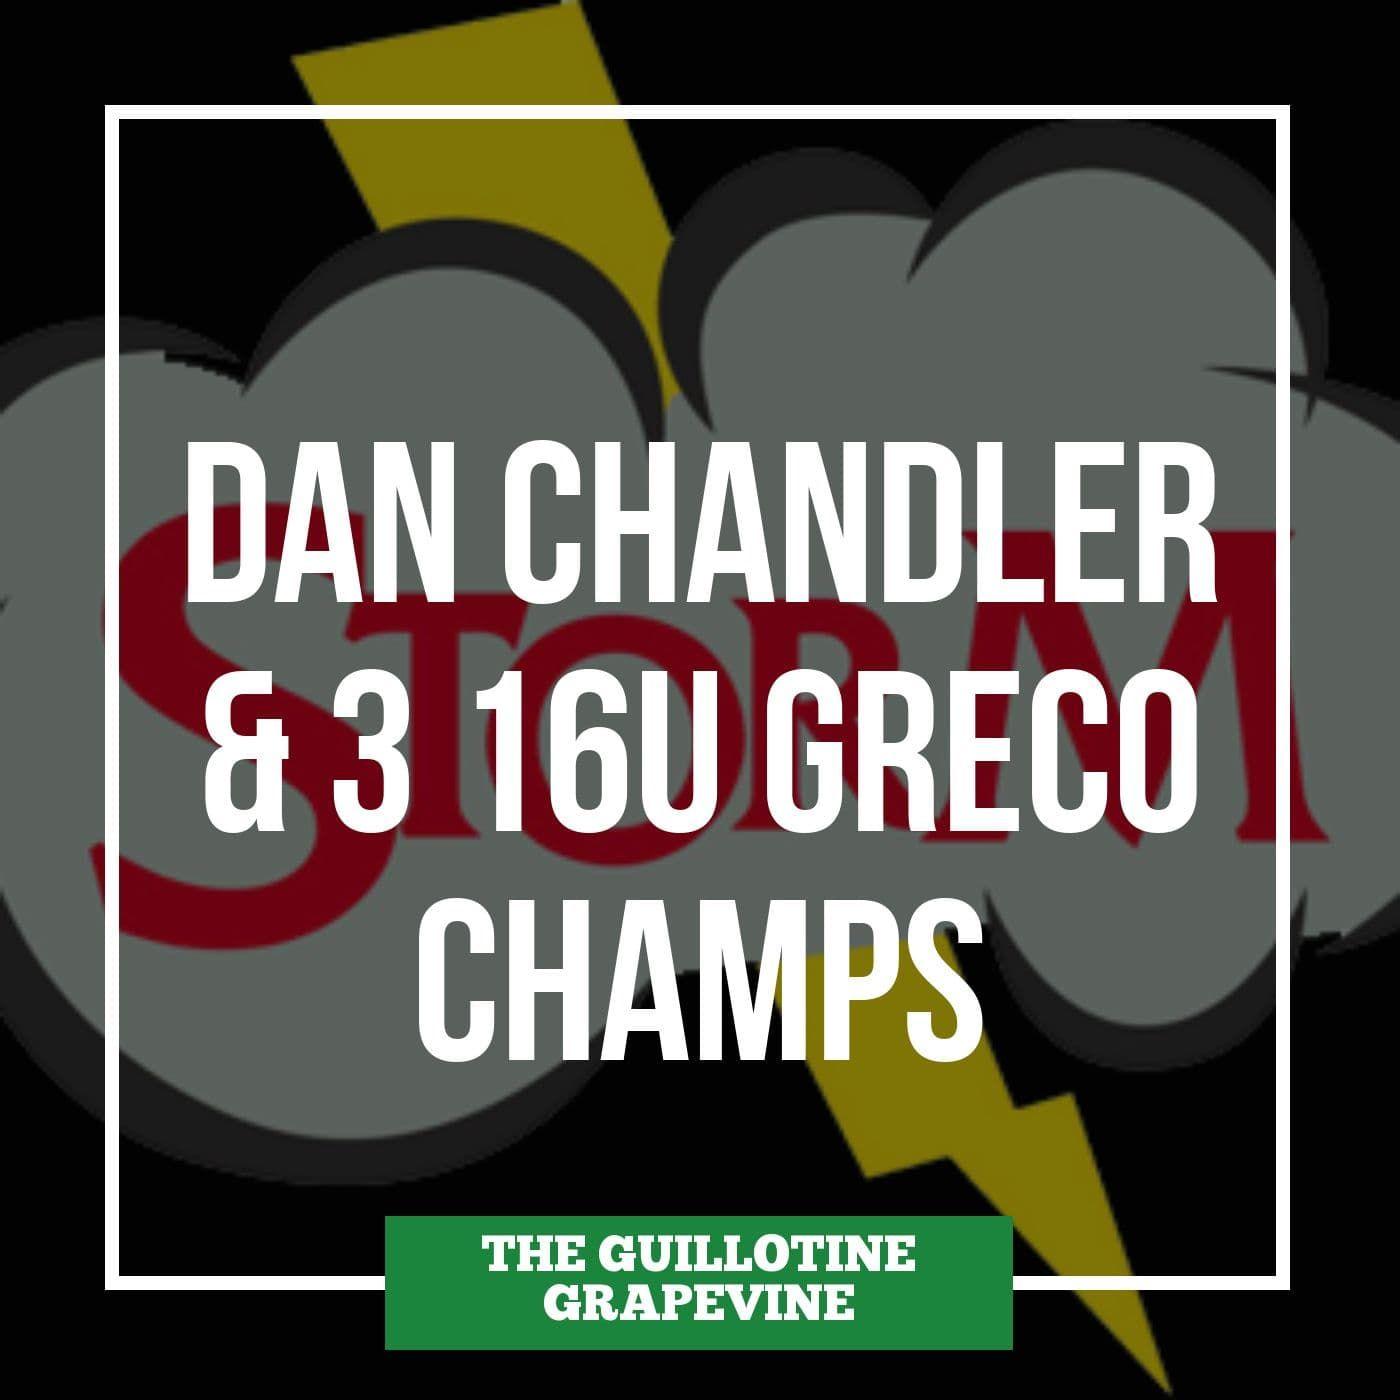 Dan Chandler talks #Fargo2019 after three Minnesota wrestlers win 16U Greco-Roman titles - GG60